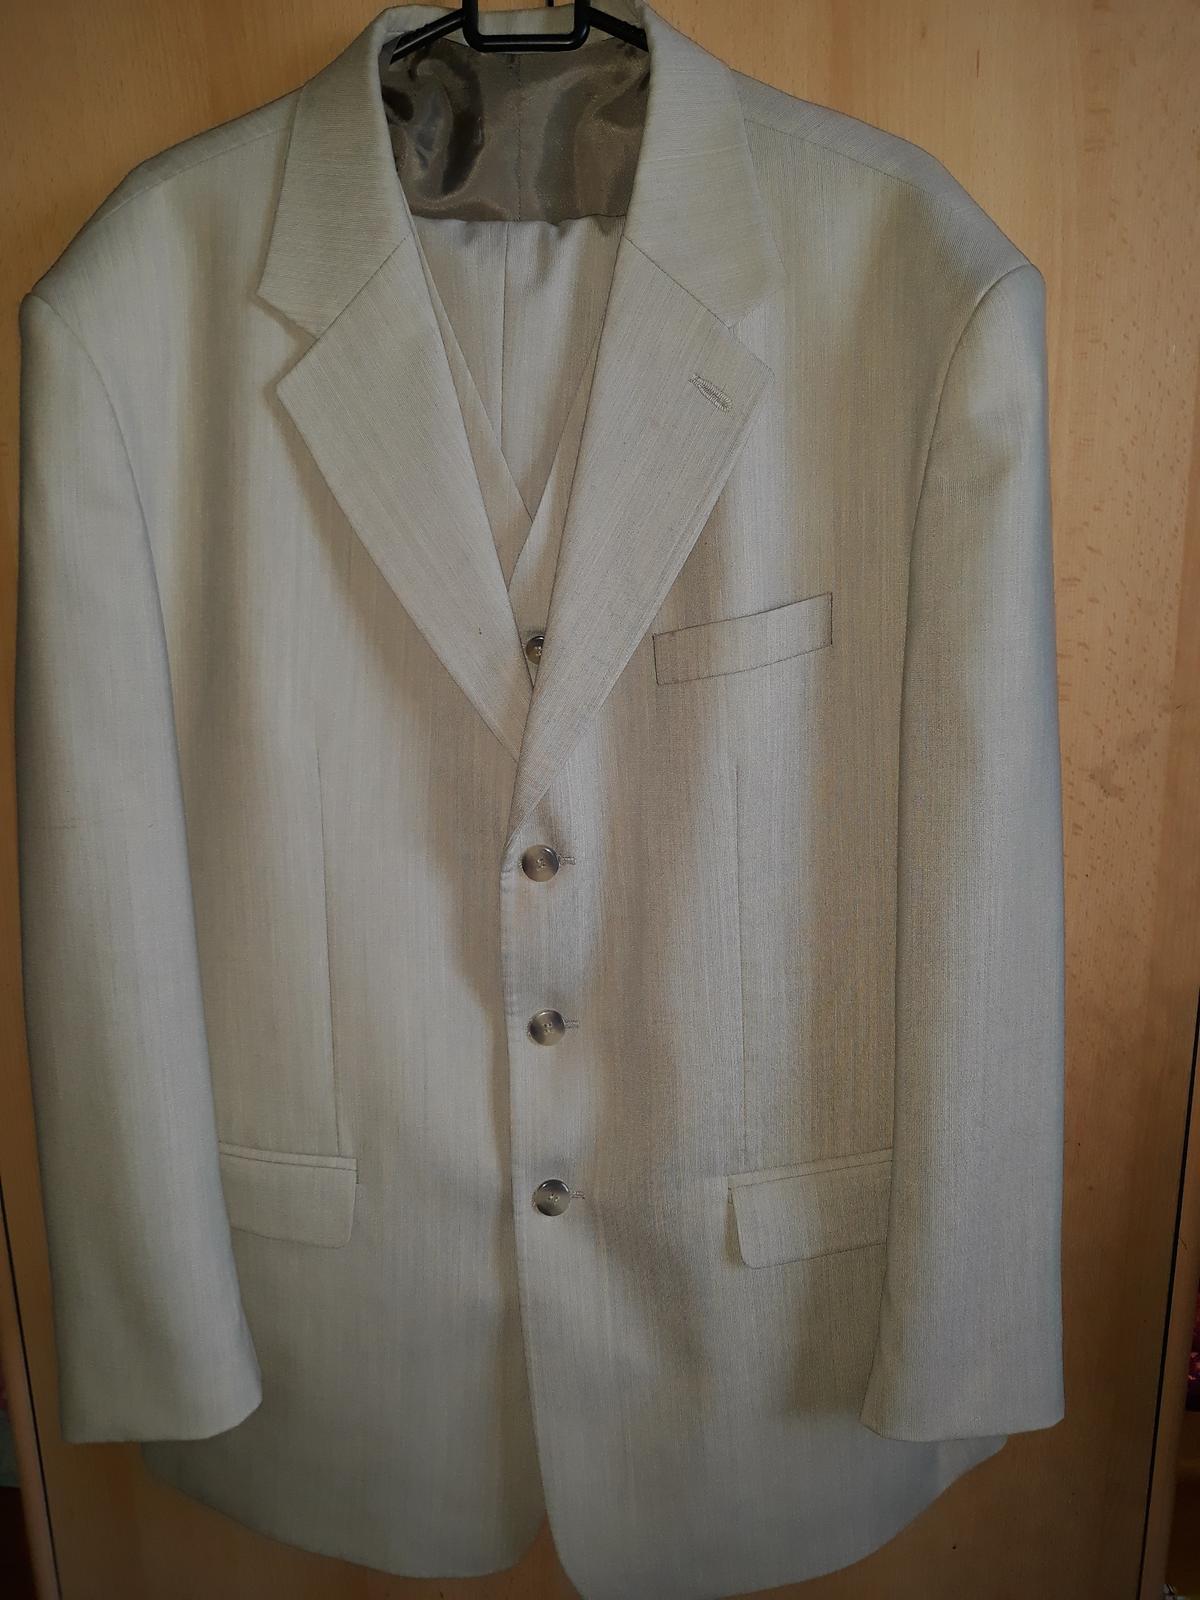 Elegantný oblek - Obrázok č. 1